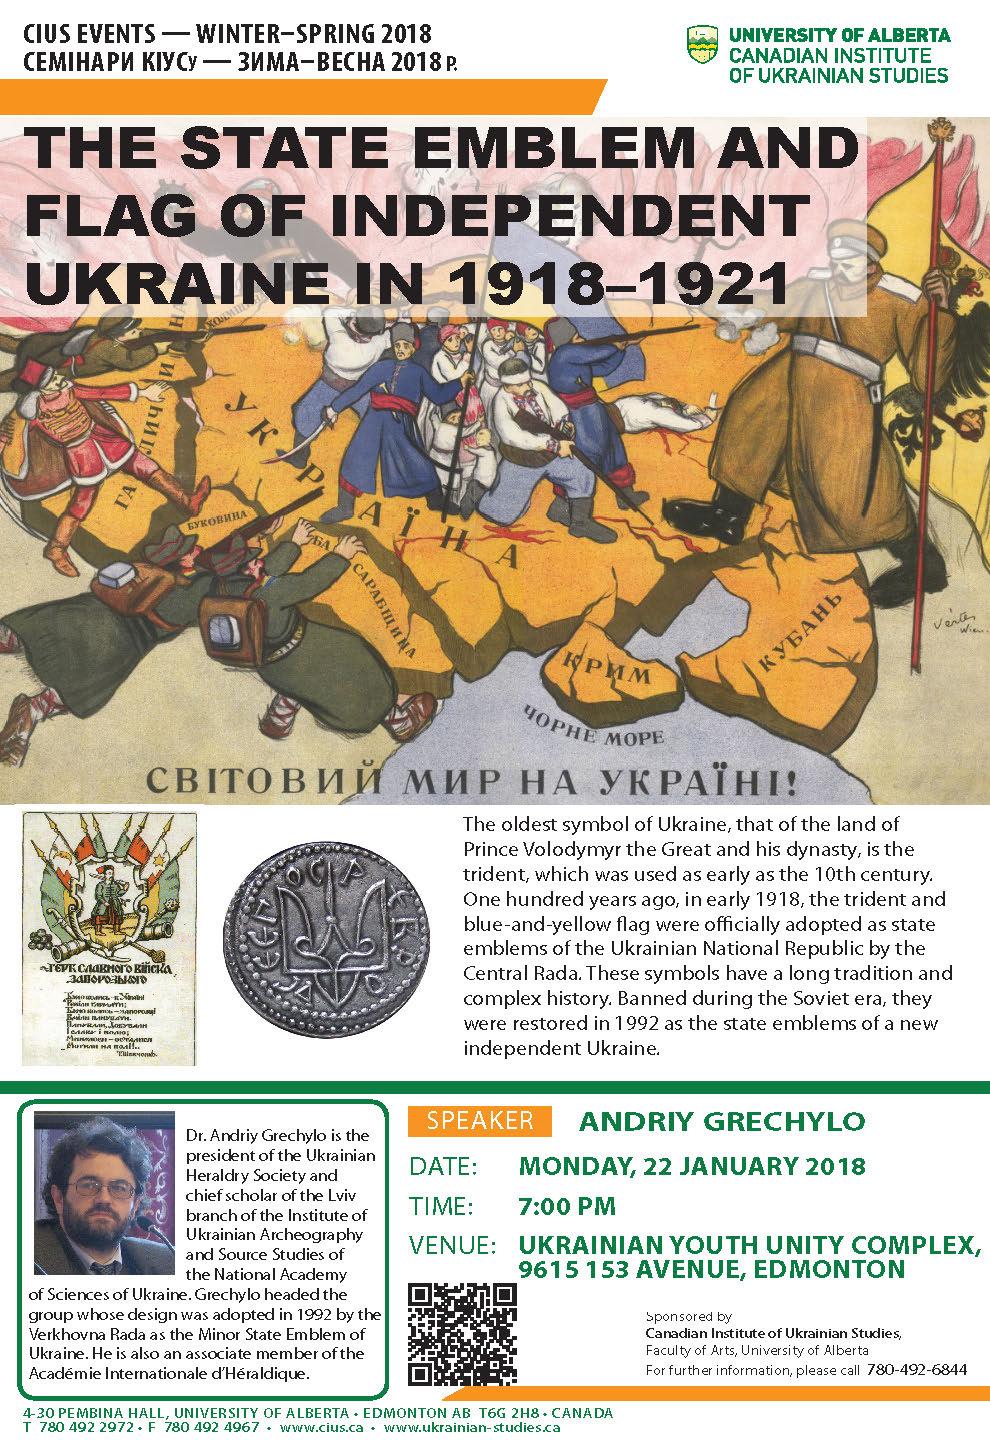 Andriy Grechylo Canadian Institute Of Ukrainian Studies